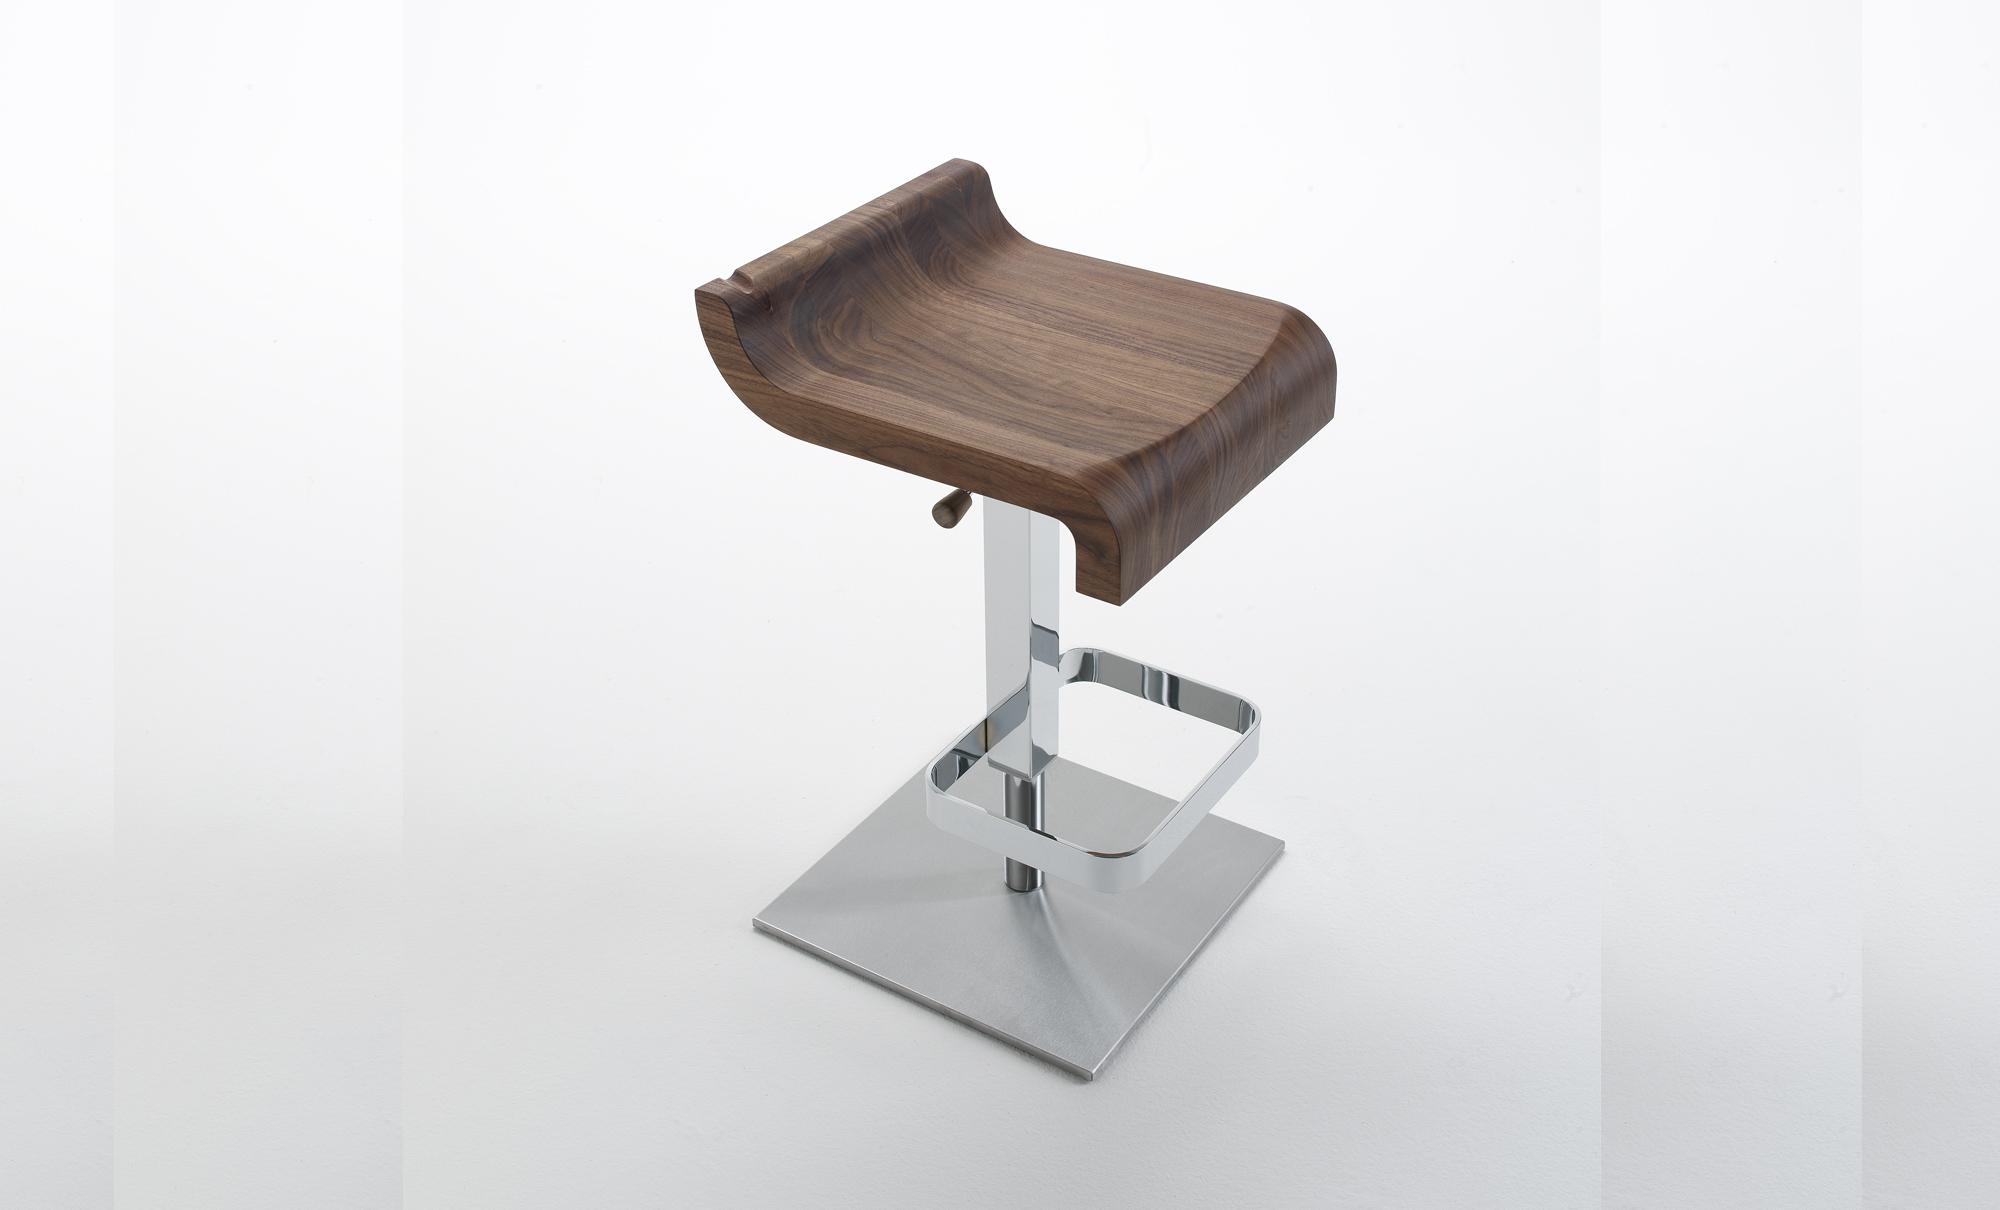 Kitchen Stools Sydney Furniture Designer Kitchen Stools Sydney Melbourne Fanuli Furniture